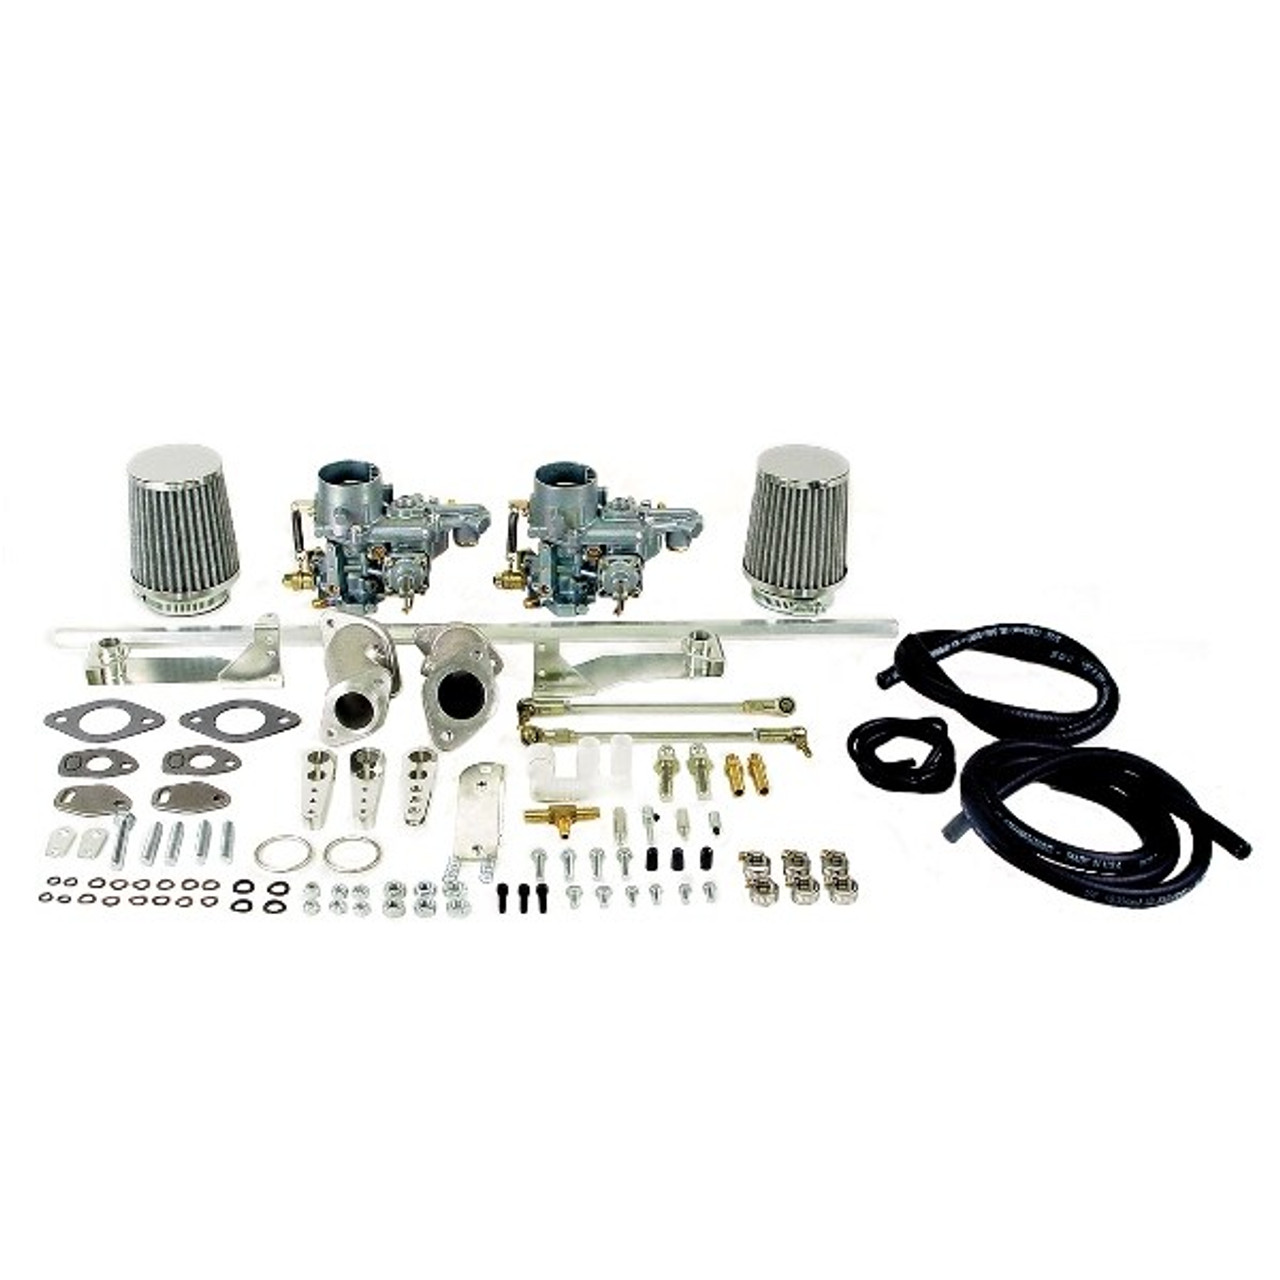 Empi Dual 34 EPC Carburetor Kit Vw Type 1 Air-cooled